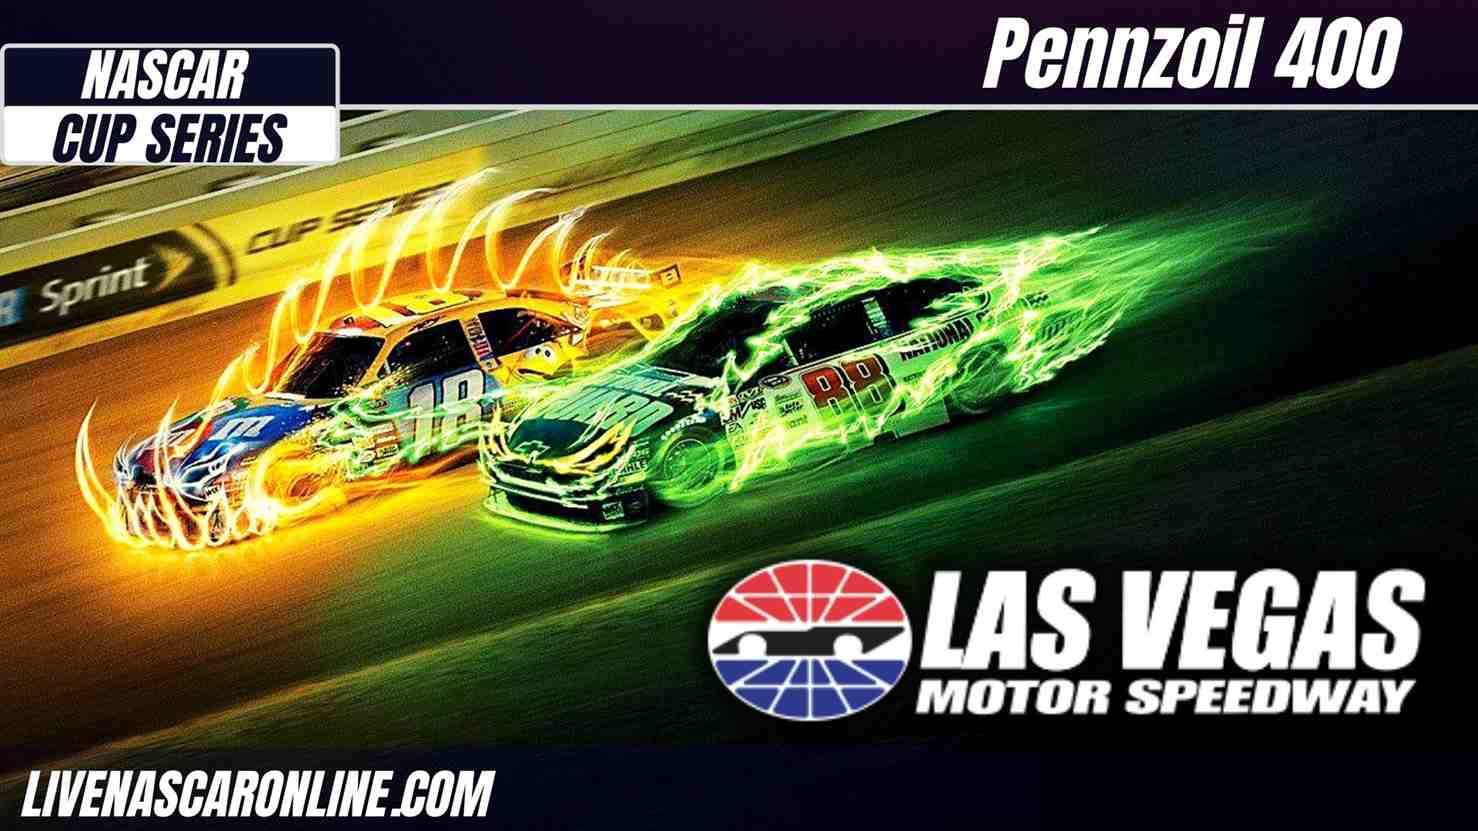 Pennzoil 400 at Las Vegas Live Stream 2021